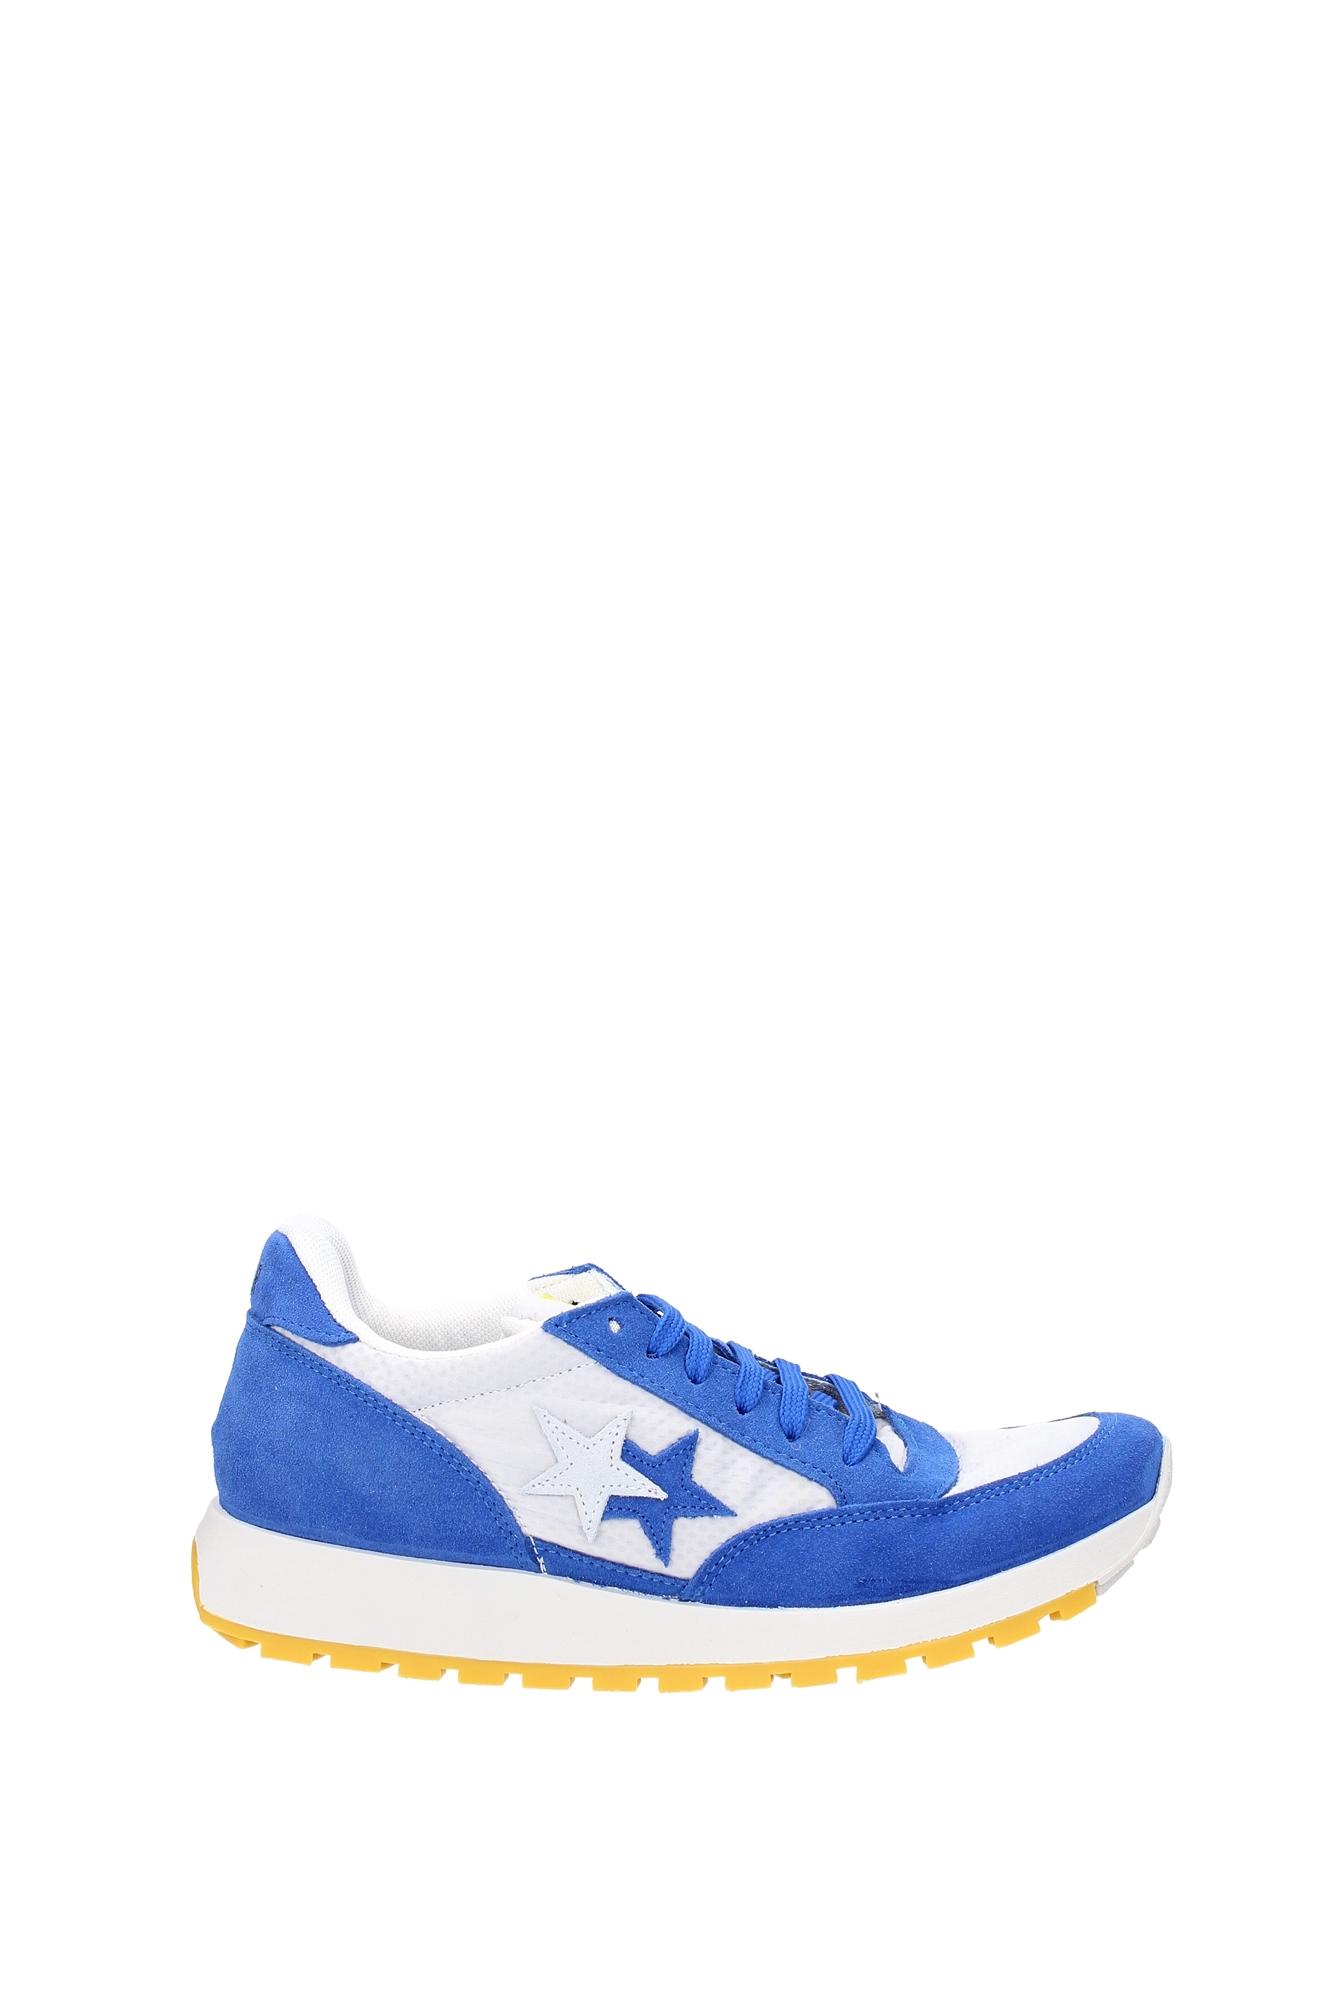 Sneakers 2star Herren - Wildleder Wildleder - (2SU1143GHIACCIOAZZURRO) 9483df